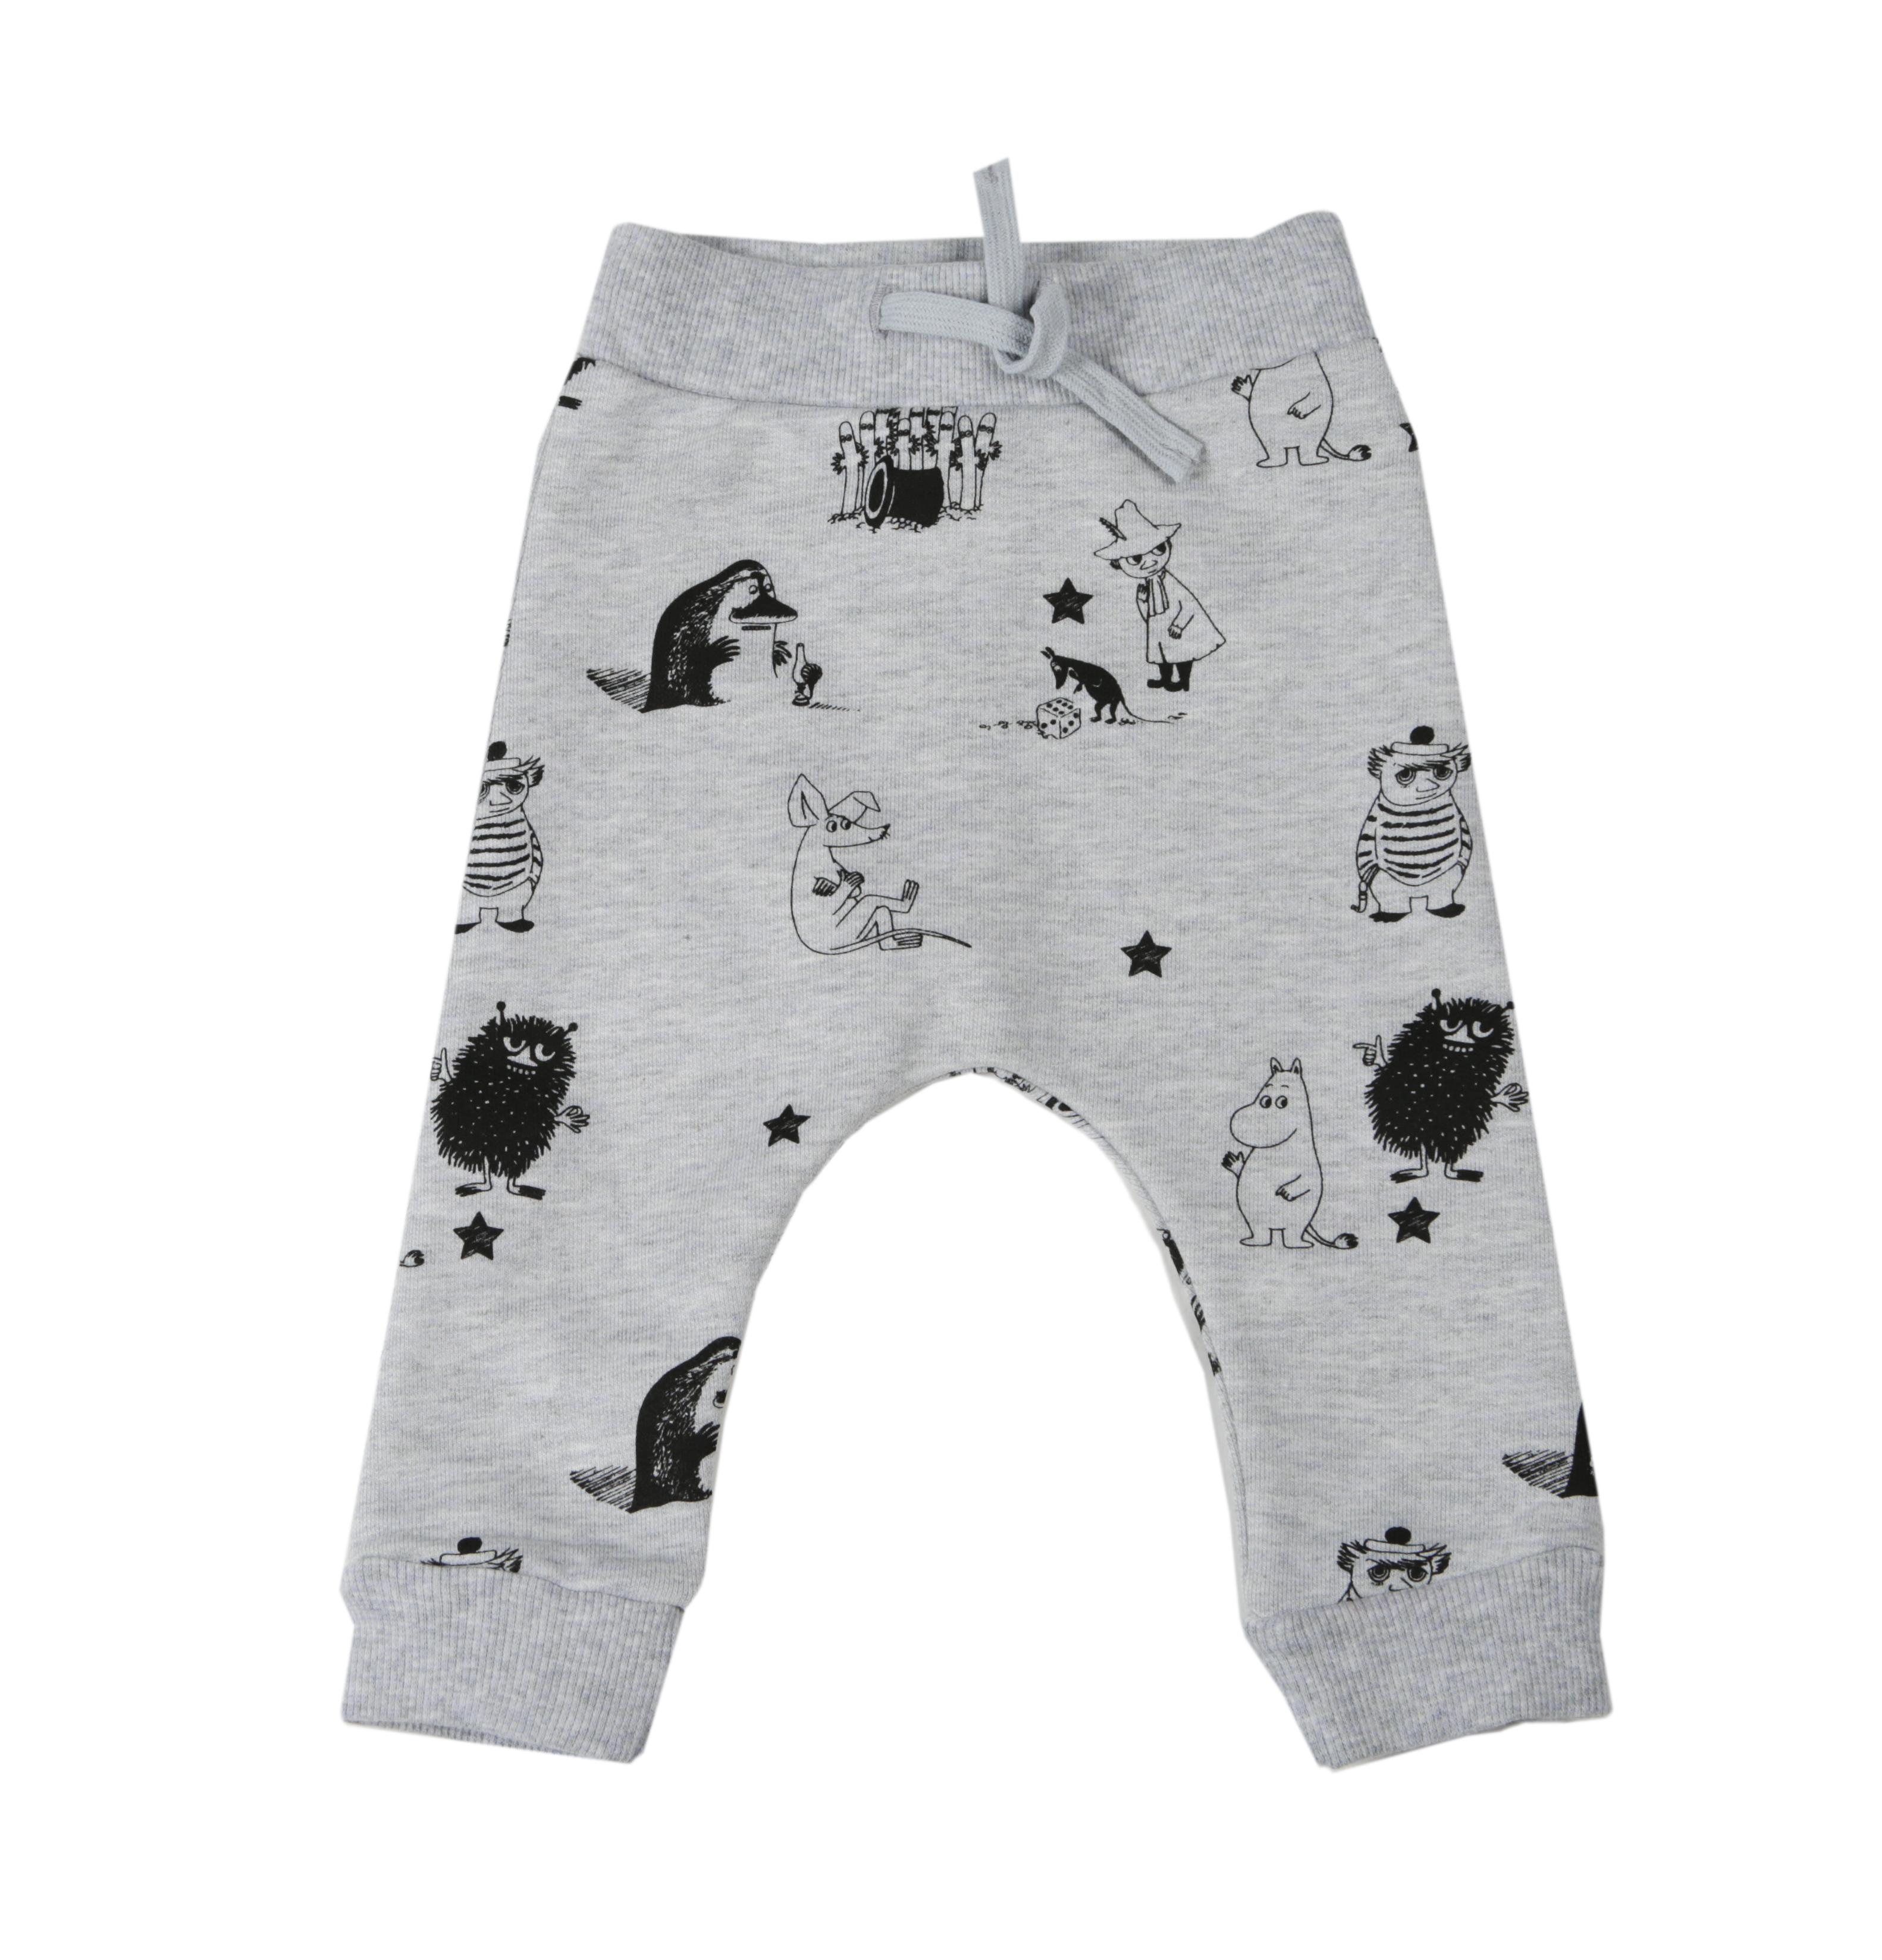 Martinex Kaverukset pants grey